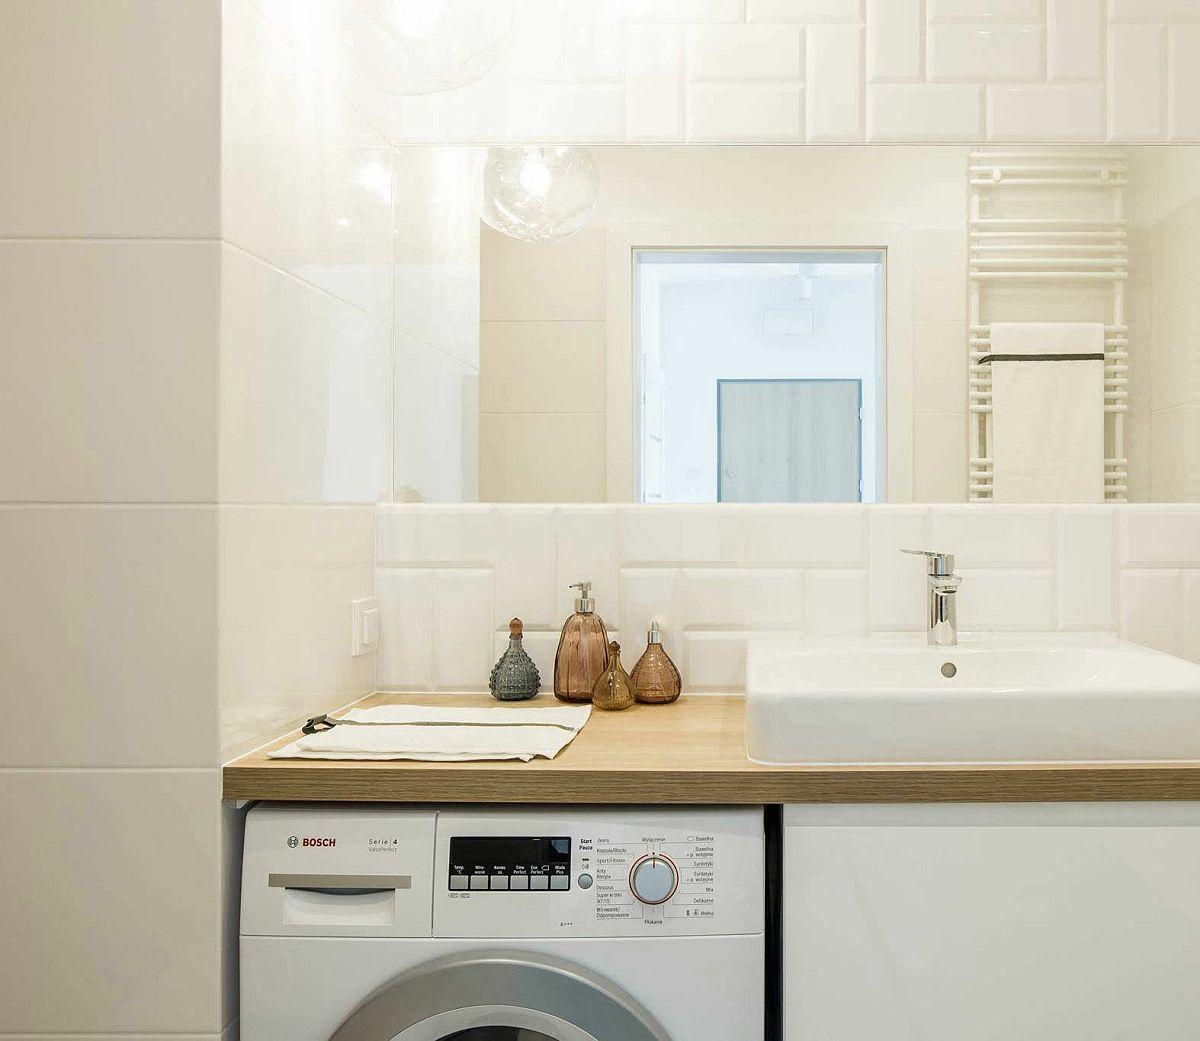 adelaparvu.com despre masina de spalat rufe in baie (5)